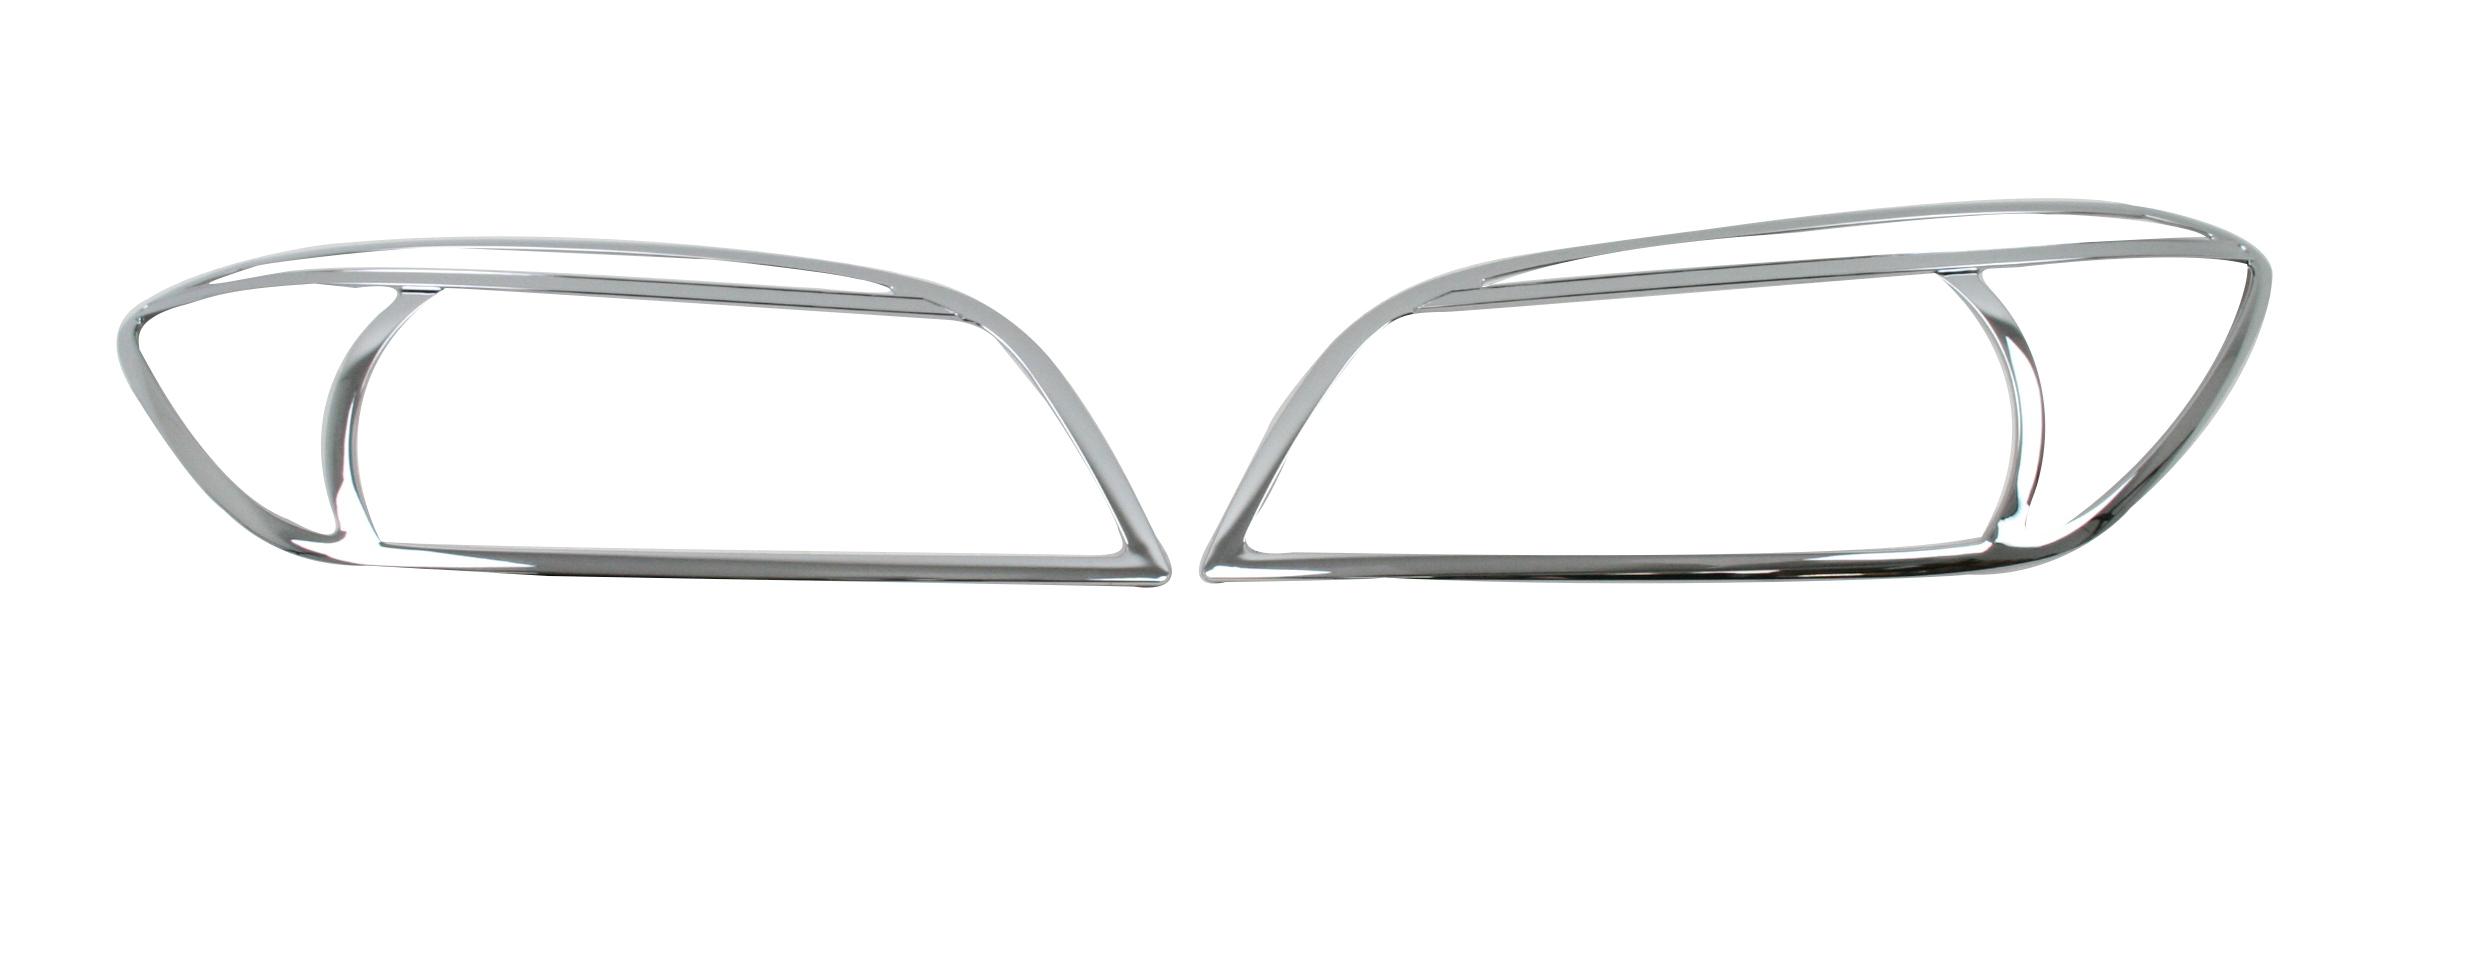 Toyota Rav4 Chrome Headlight Surrounds Head Lamp